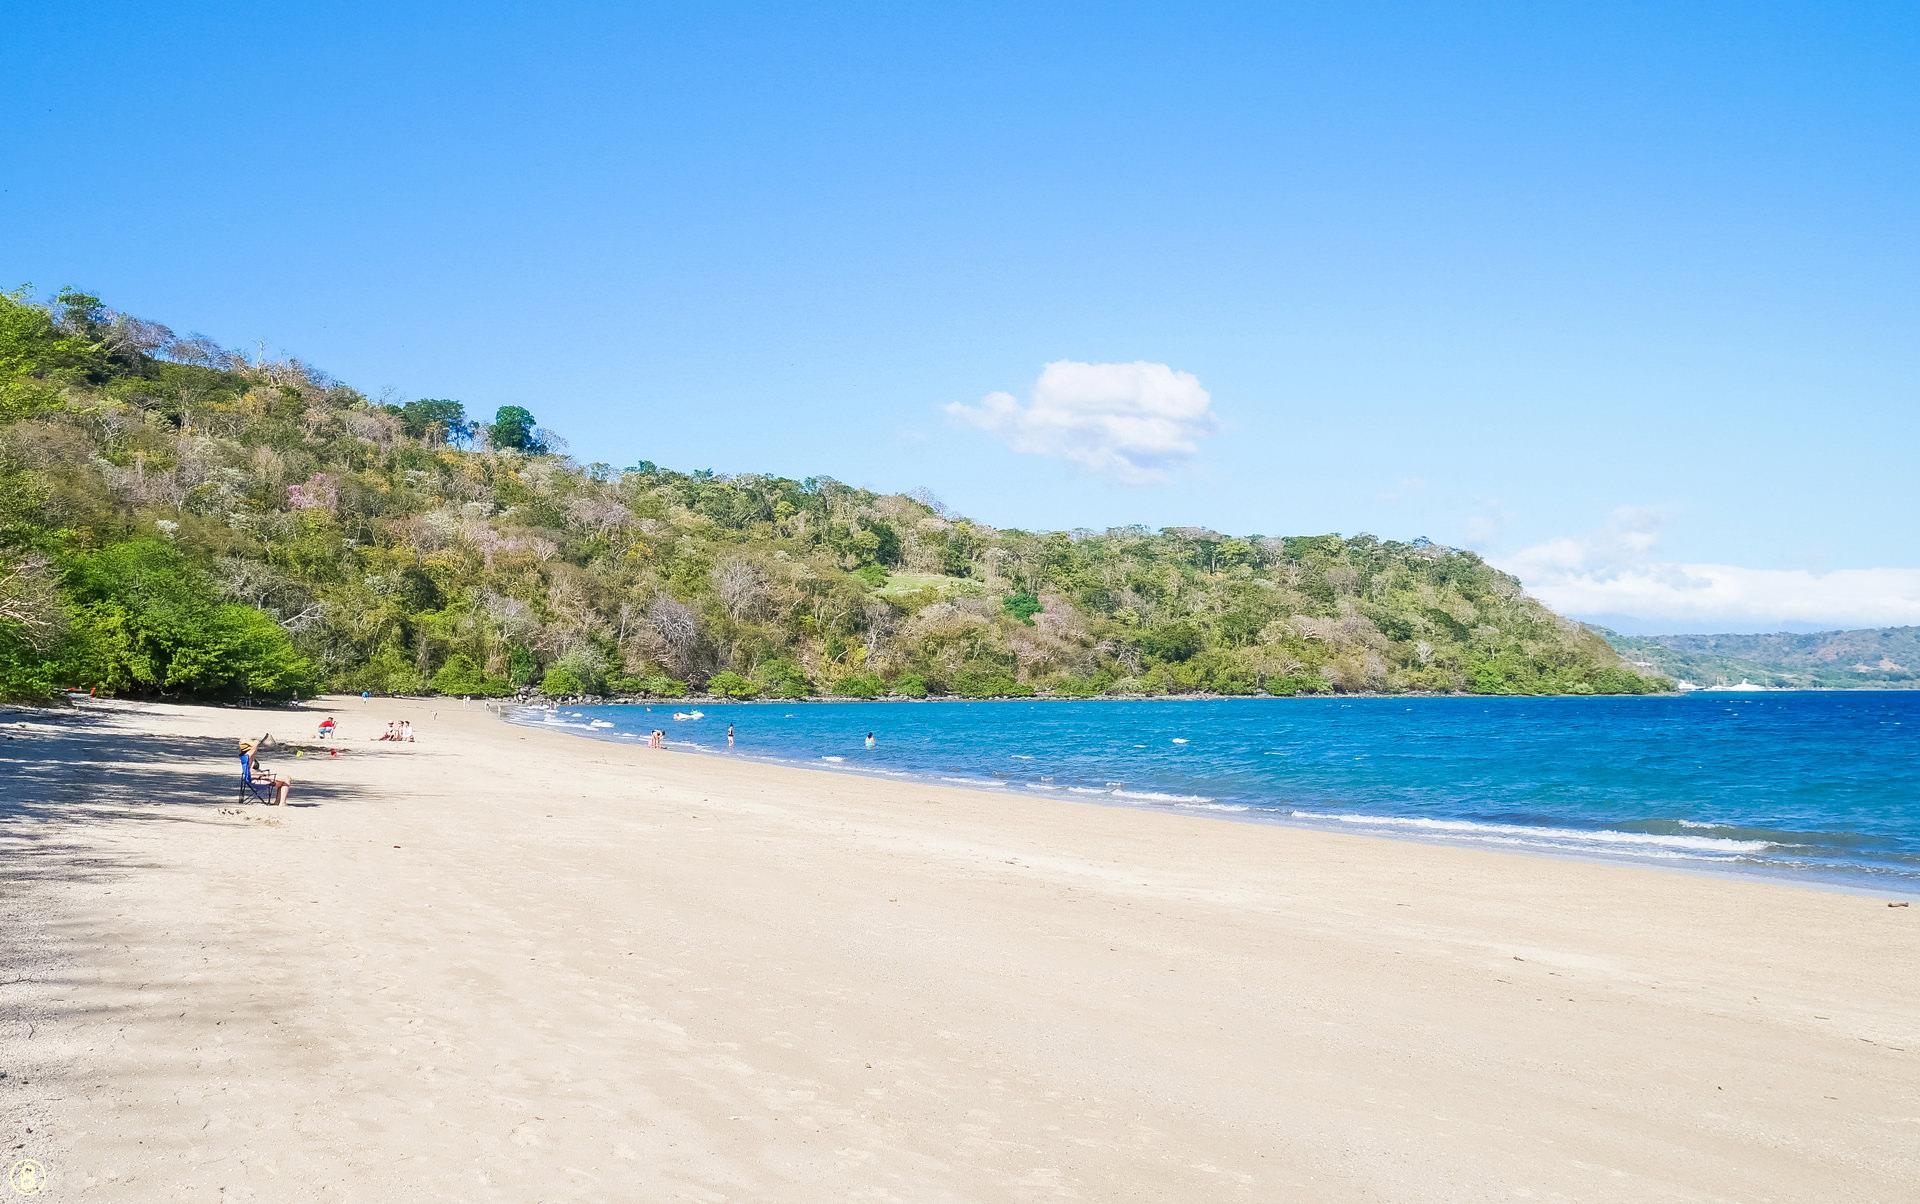 playa blanca beach papagayo guanacaste costa rica